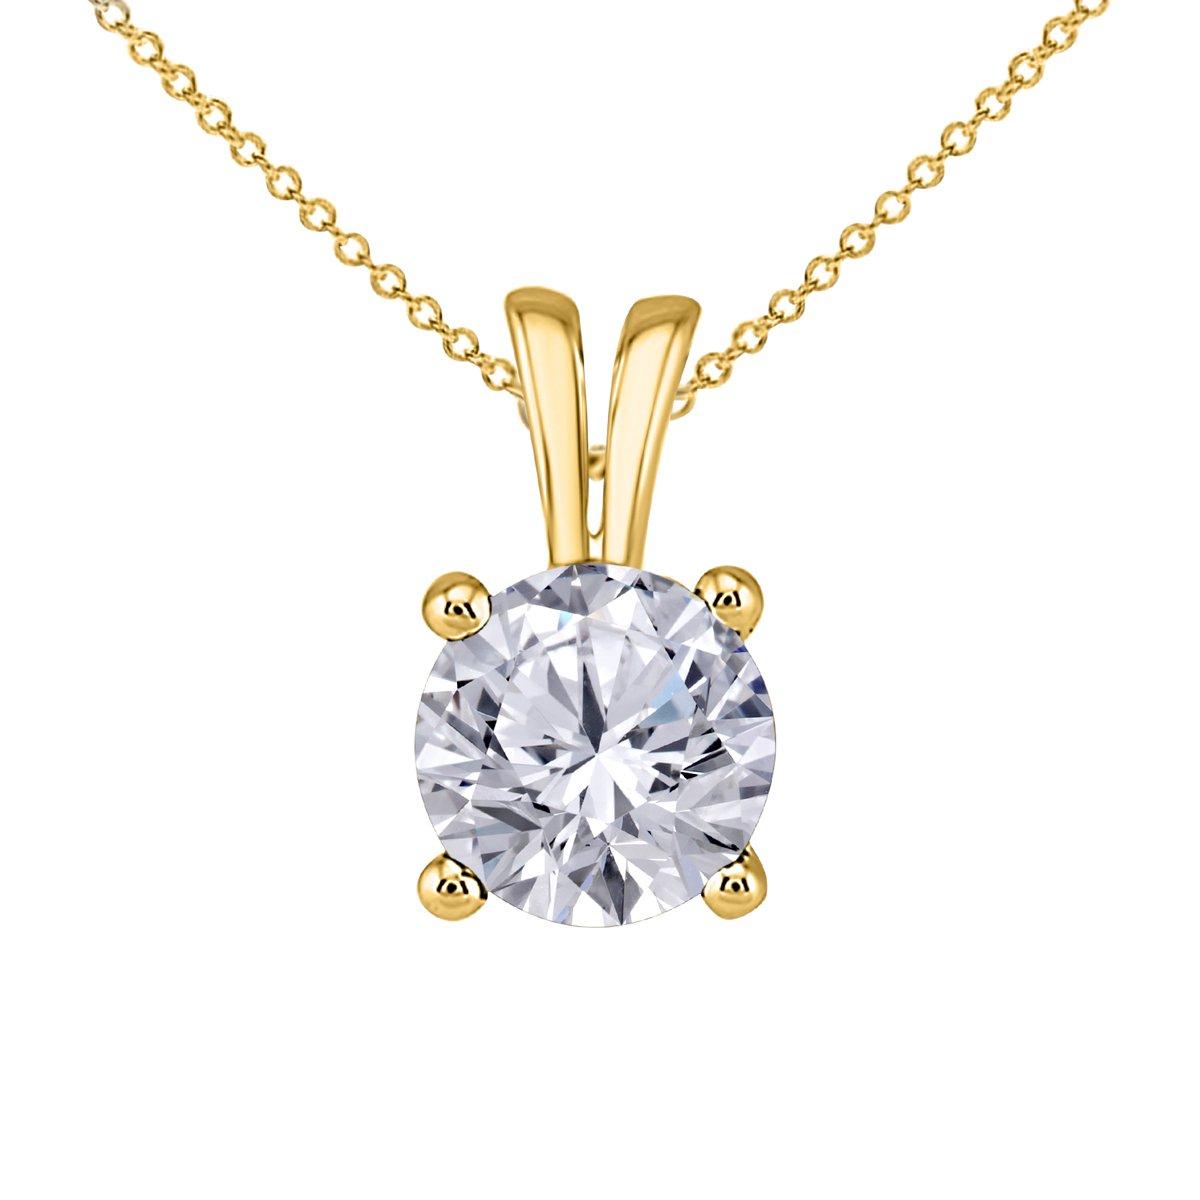 Hot Classic Look 1.00 Ct Round Cut Black Sapphire CZ Solitaire Pendant Necklace for Women 18 16+2 Ext.